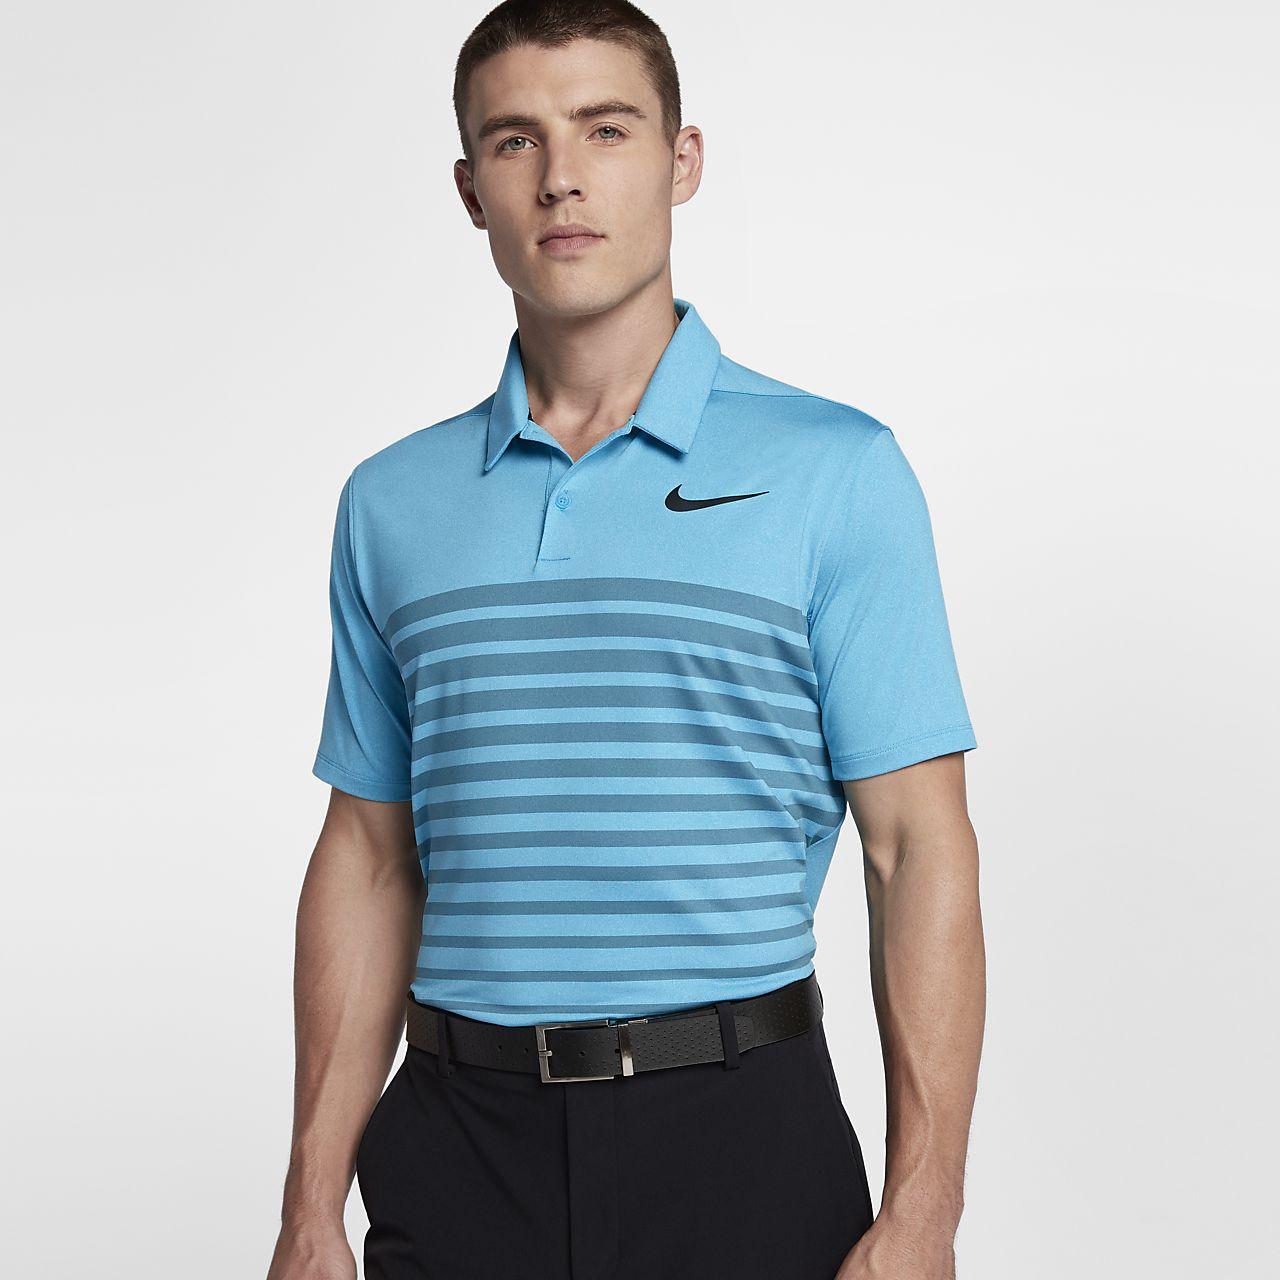 ... Nike Dry Heather Stripe Men's Standard Fit Golf Polo